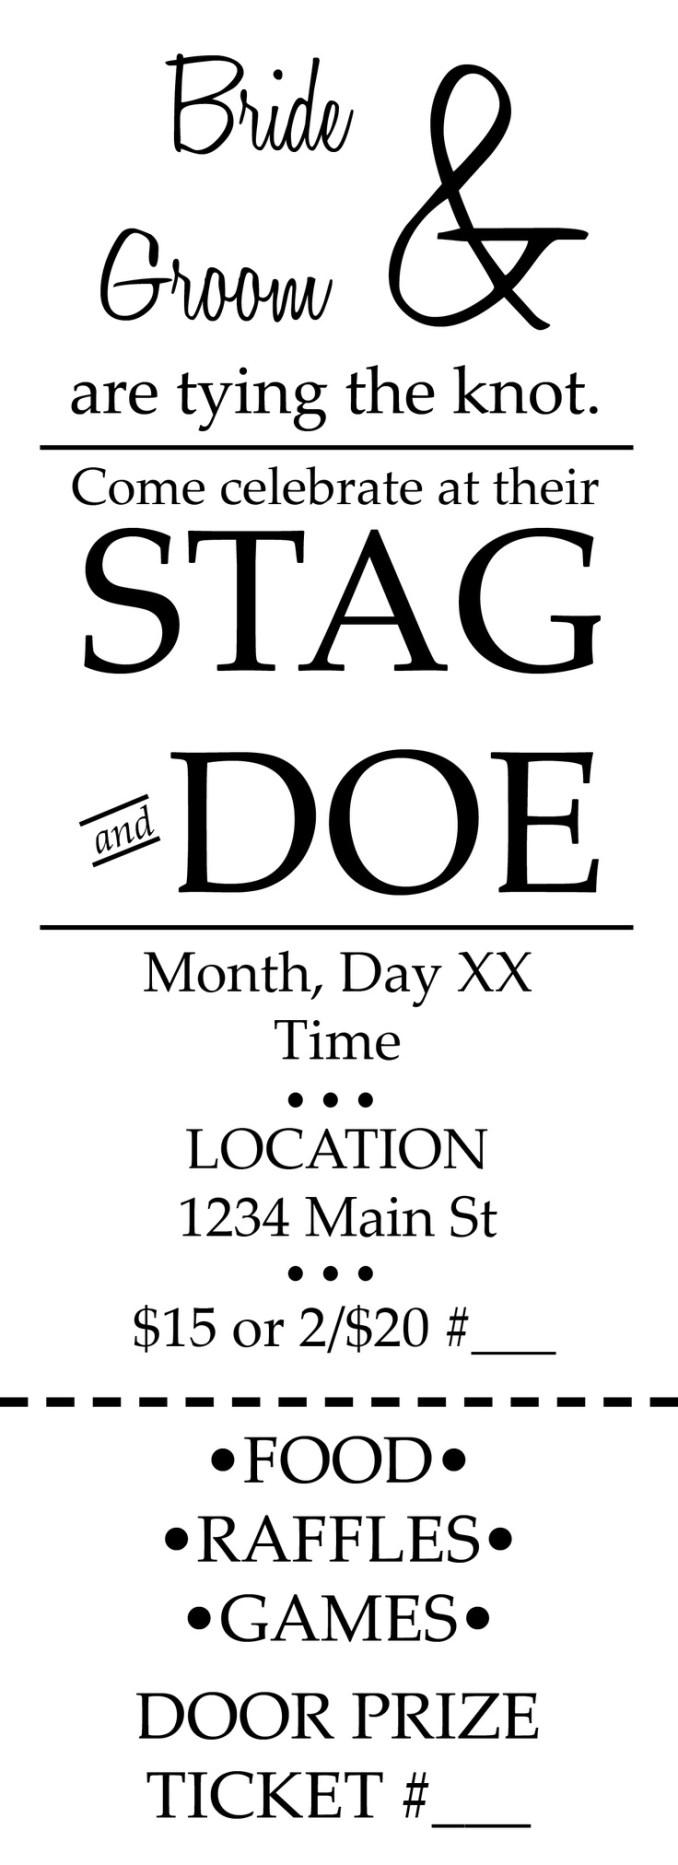 Funny Stag And Doe Invites | Newsinvitation.co